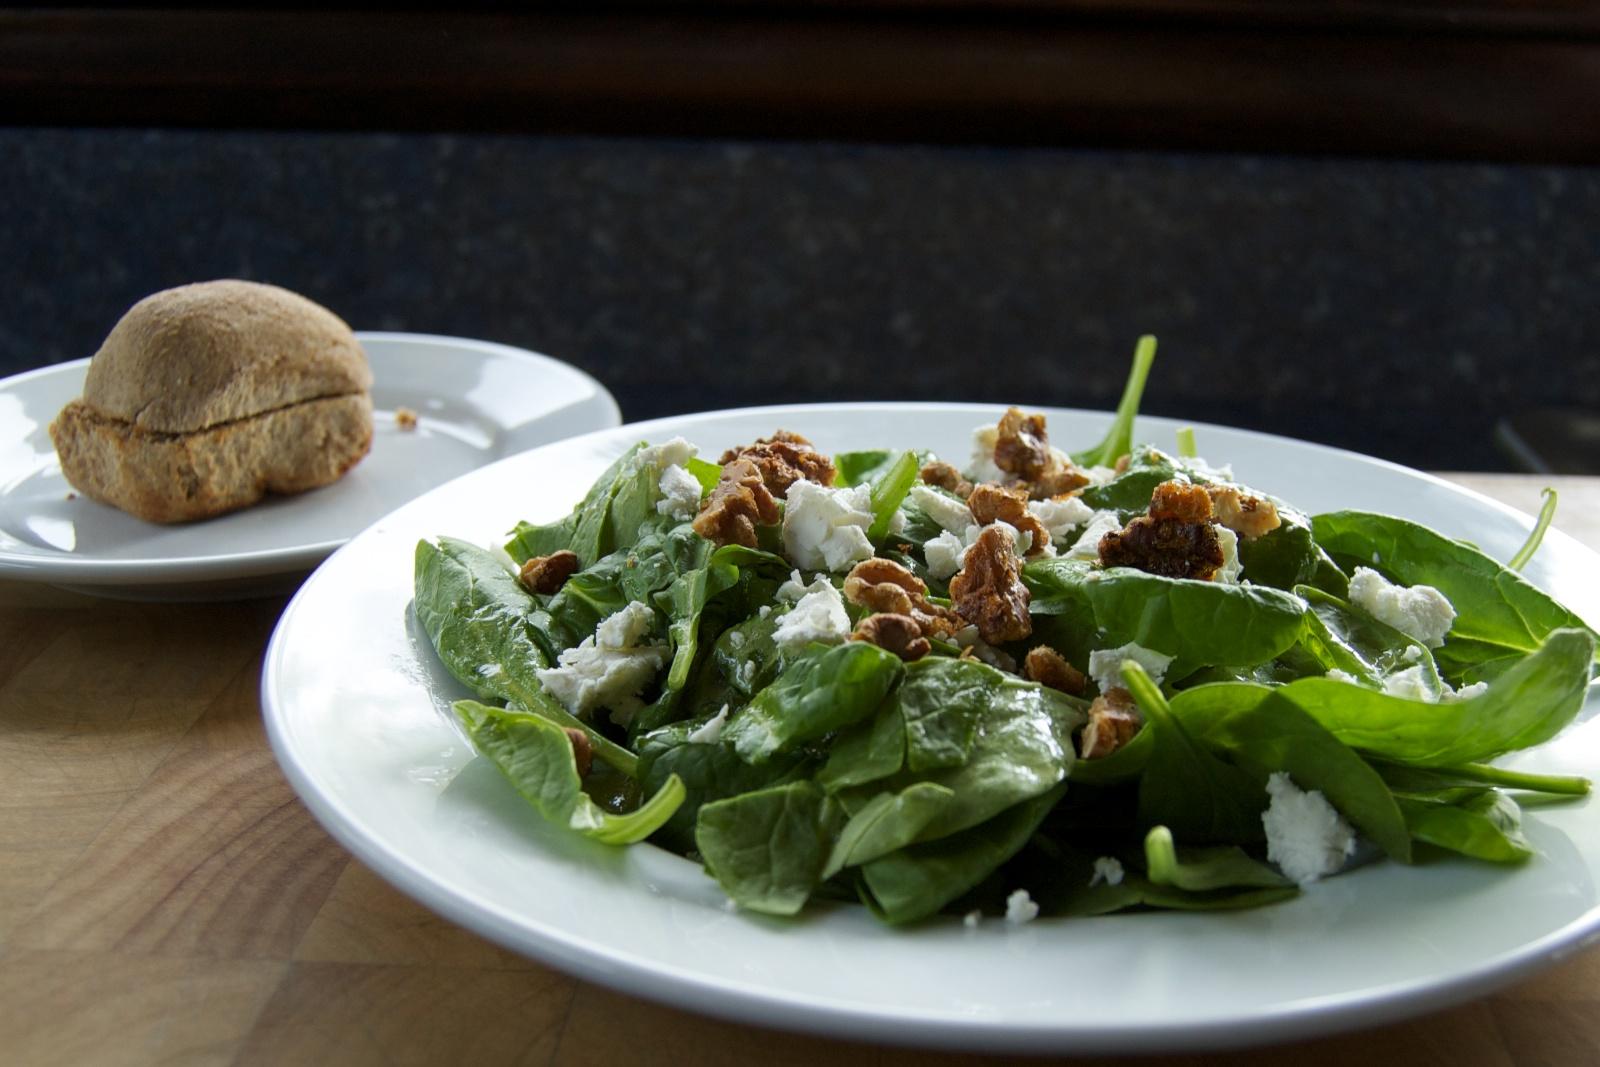 http://blog.rickk.com/food/2012/05/29/ate.2012.05.29.l.jpg